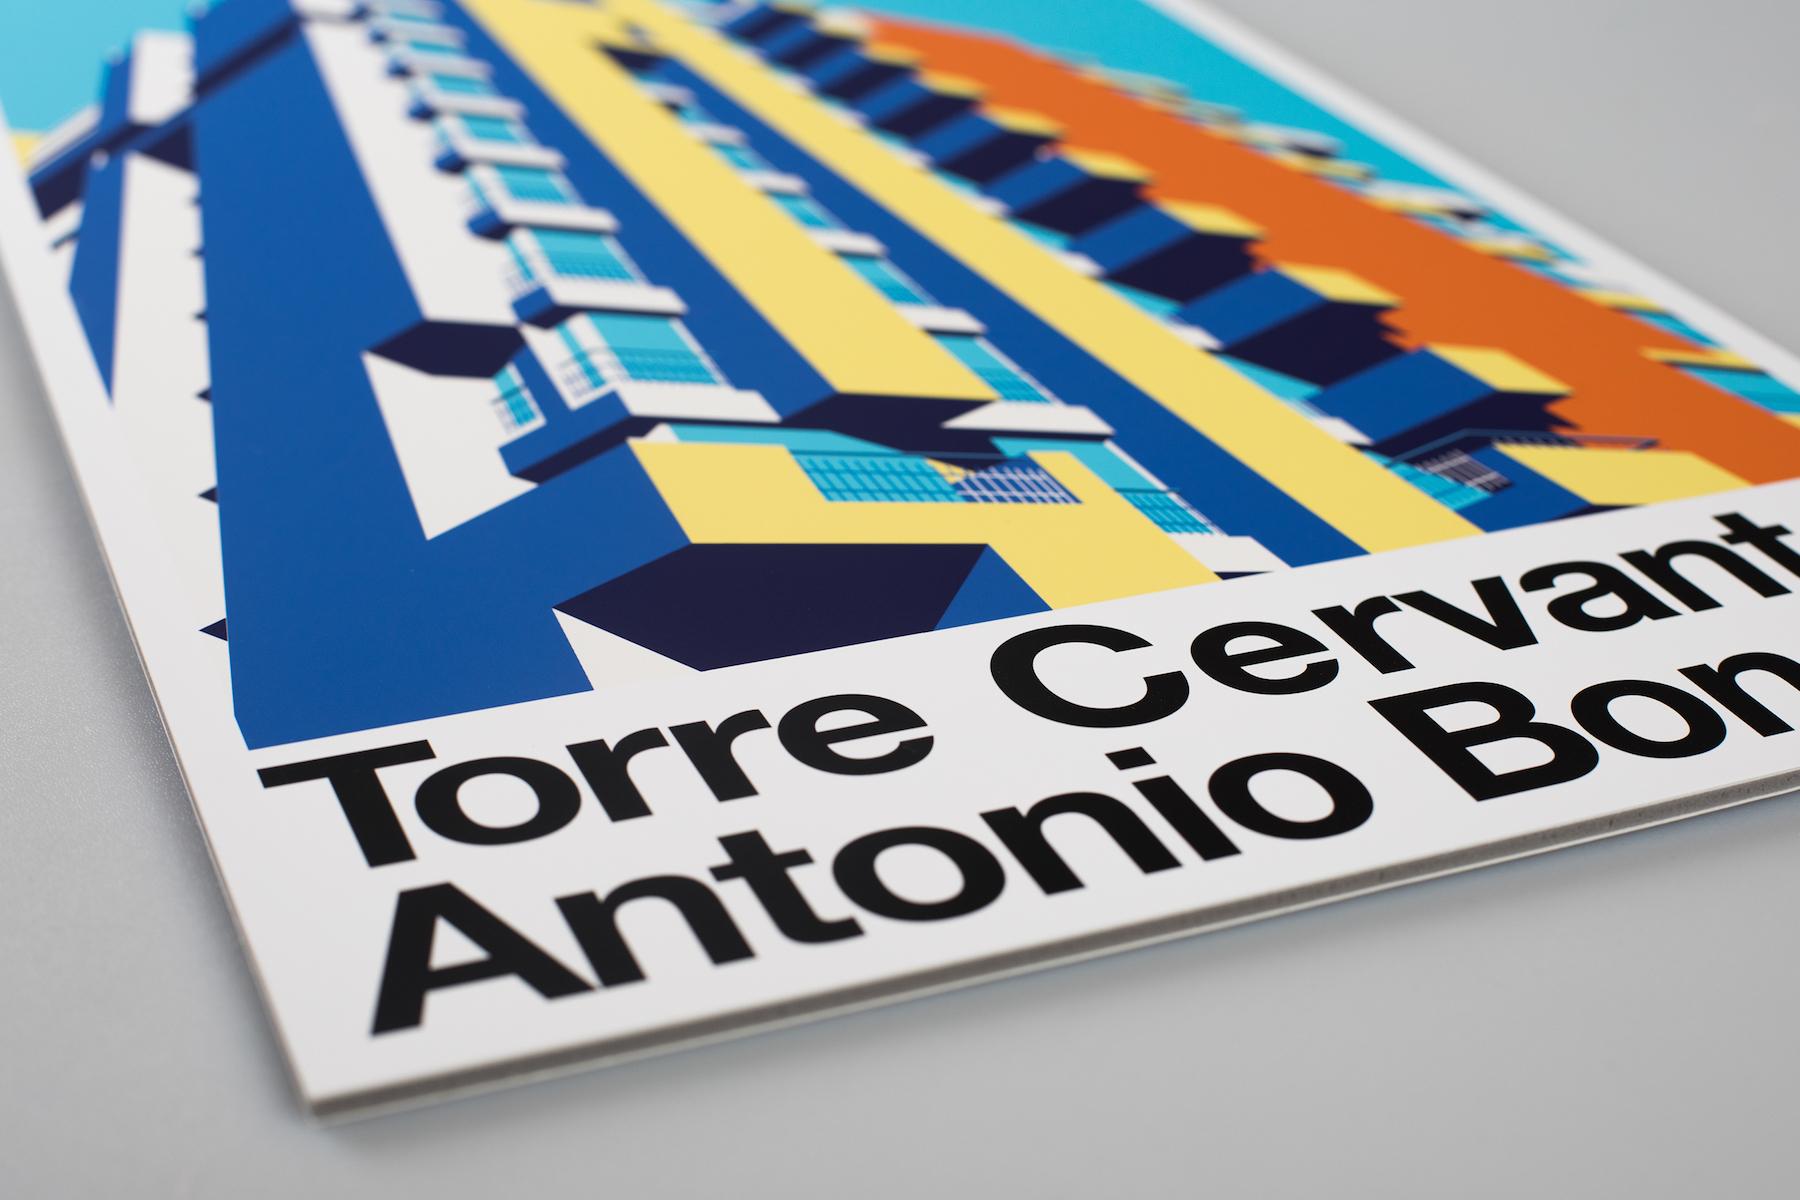 Architecture Illustration Tribute to Antonio Bonet